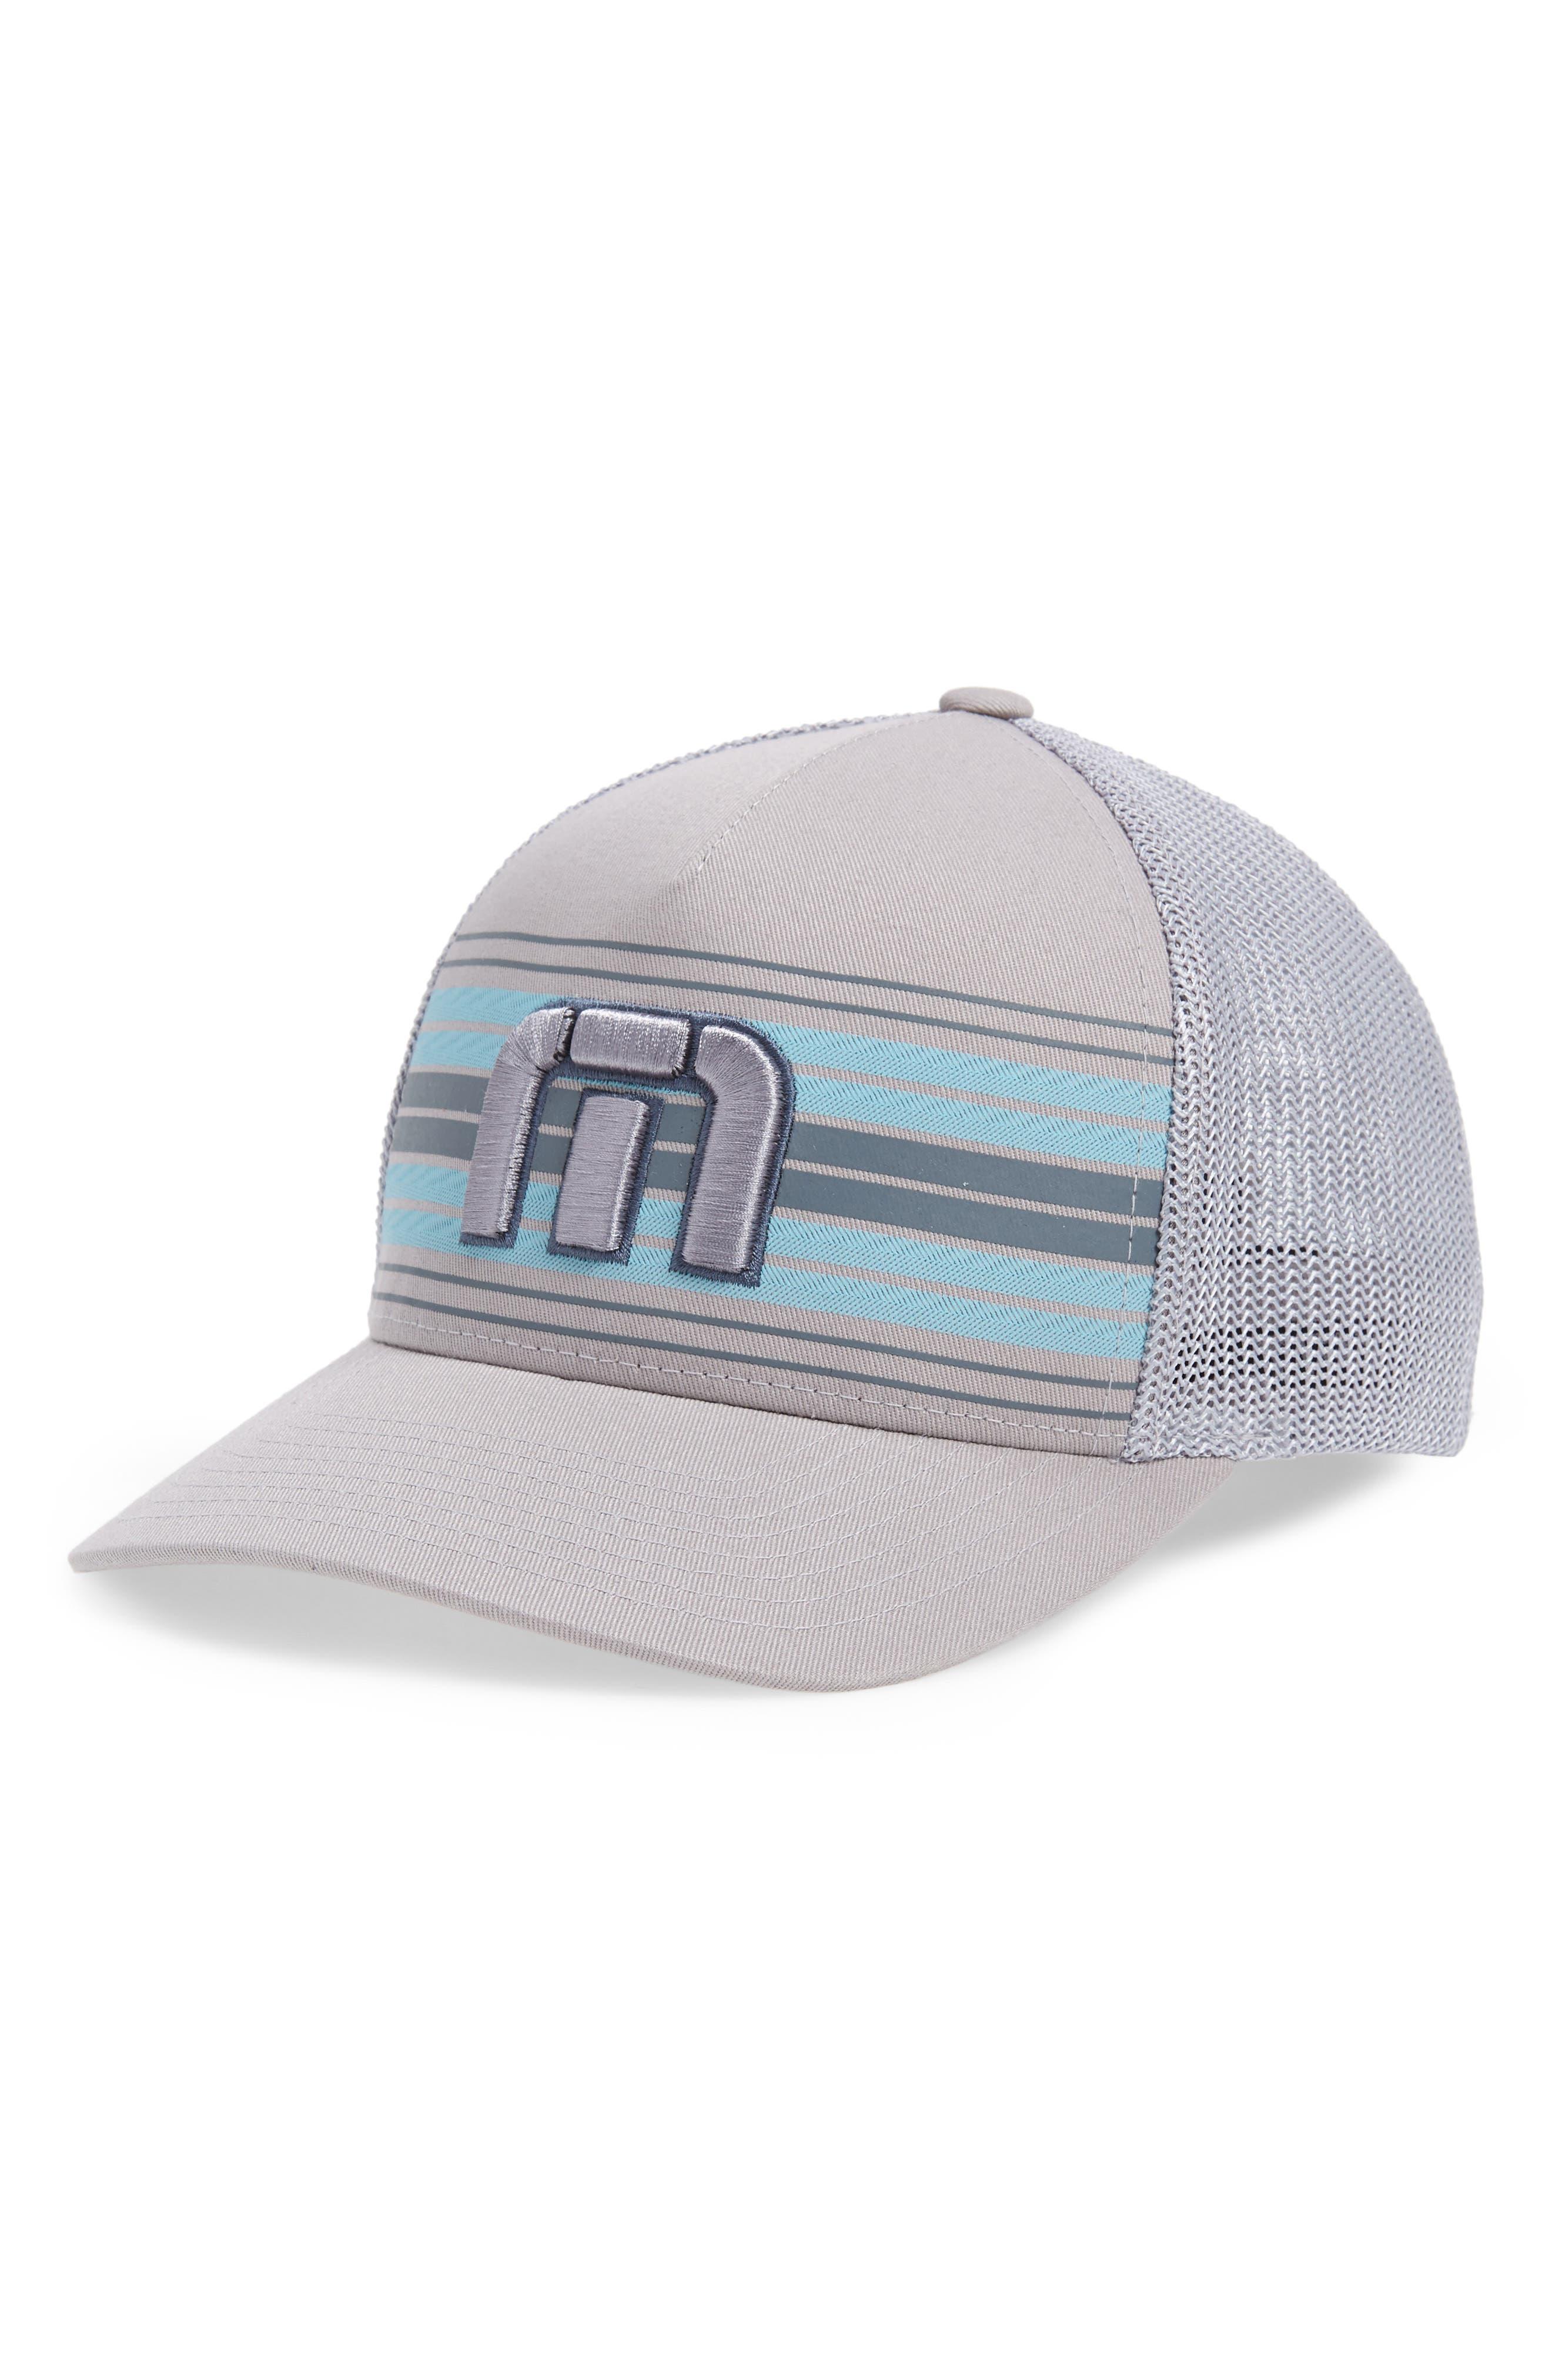 Tweele Trucker Cap,                         Main,                         color, SHARKSKIN